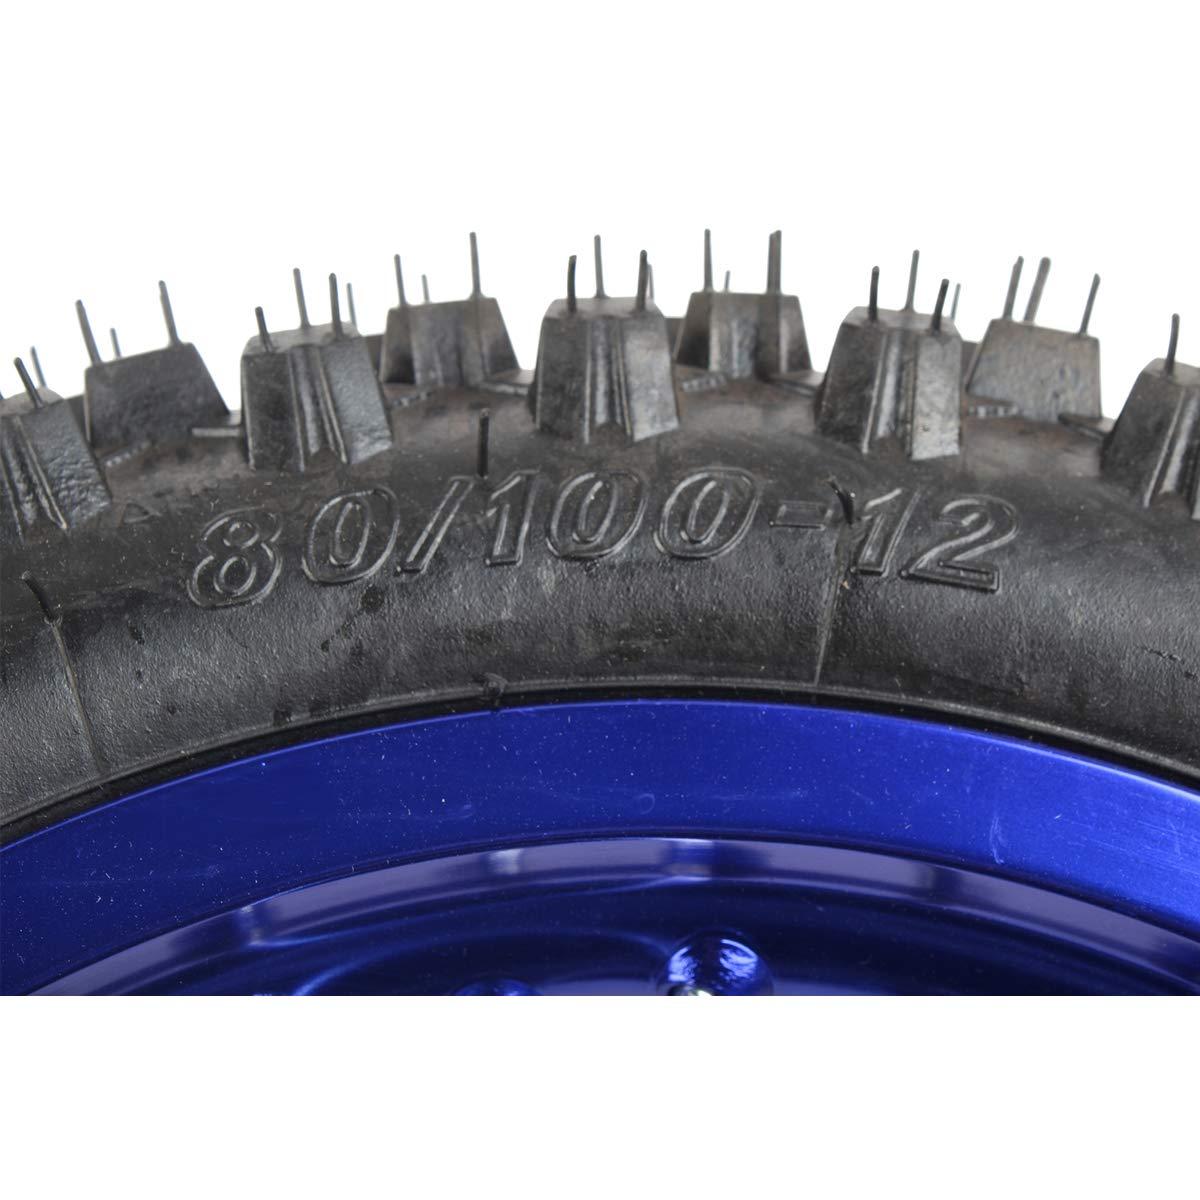 X-PRO 12 Rear Wheel Rim Tire Assembly for 110cc 125cc 140cc 150cc 160cc Dirt Bikes